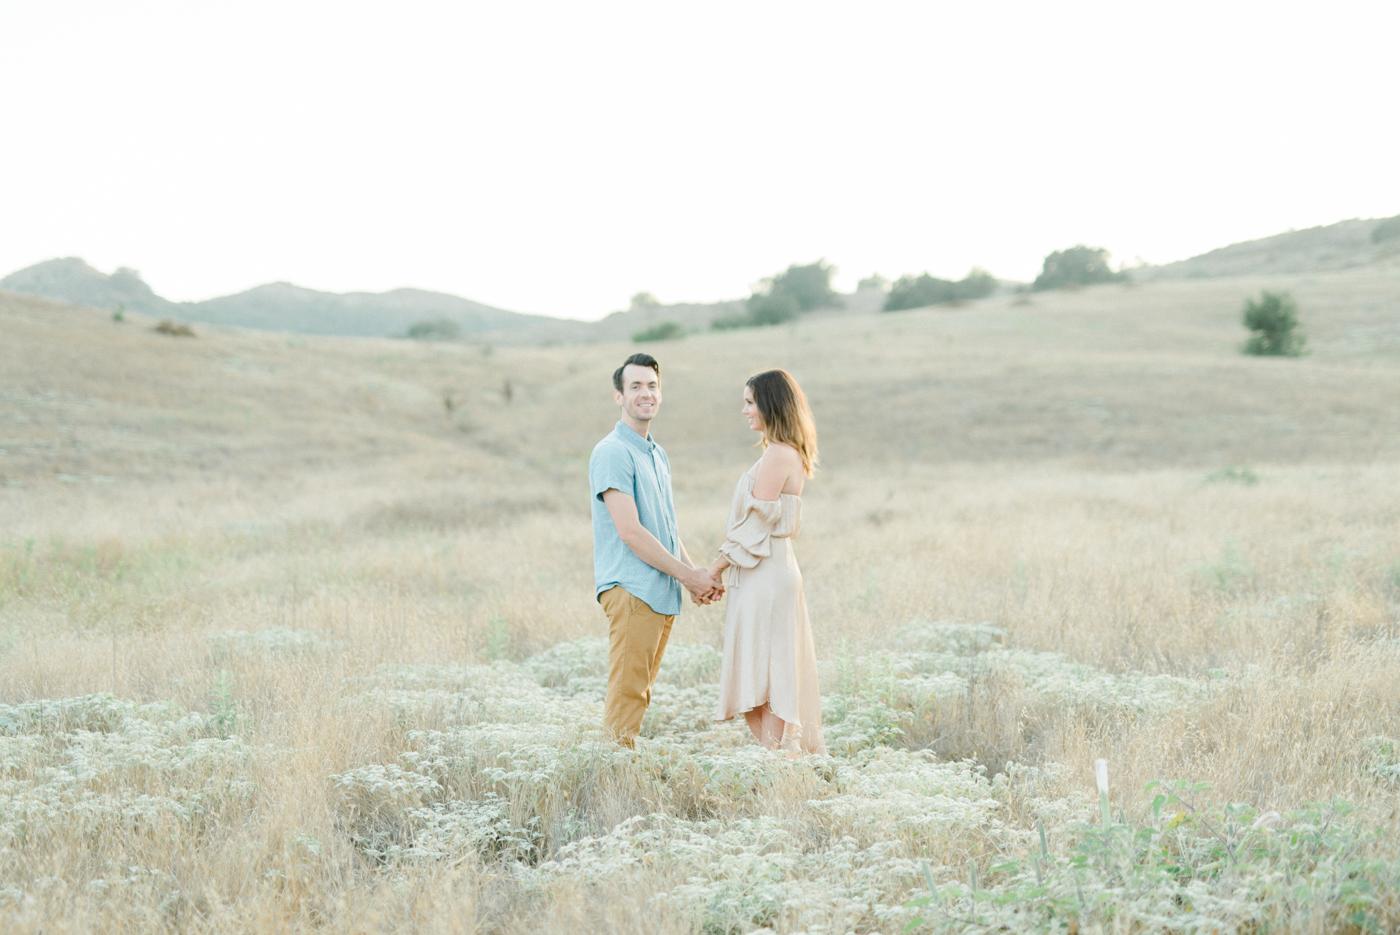 Malibu_Creek_State_Park_Romantic_Engagement_Session_C&J_romantic-22.jpg